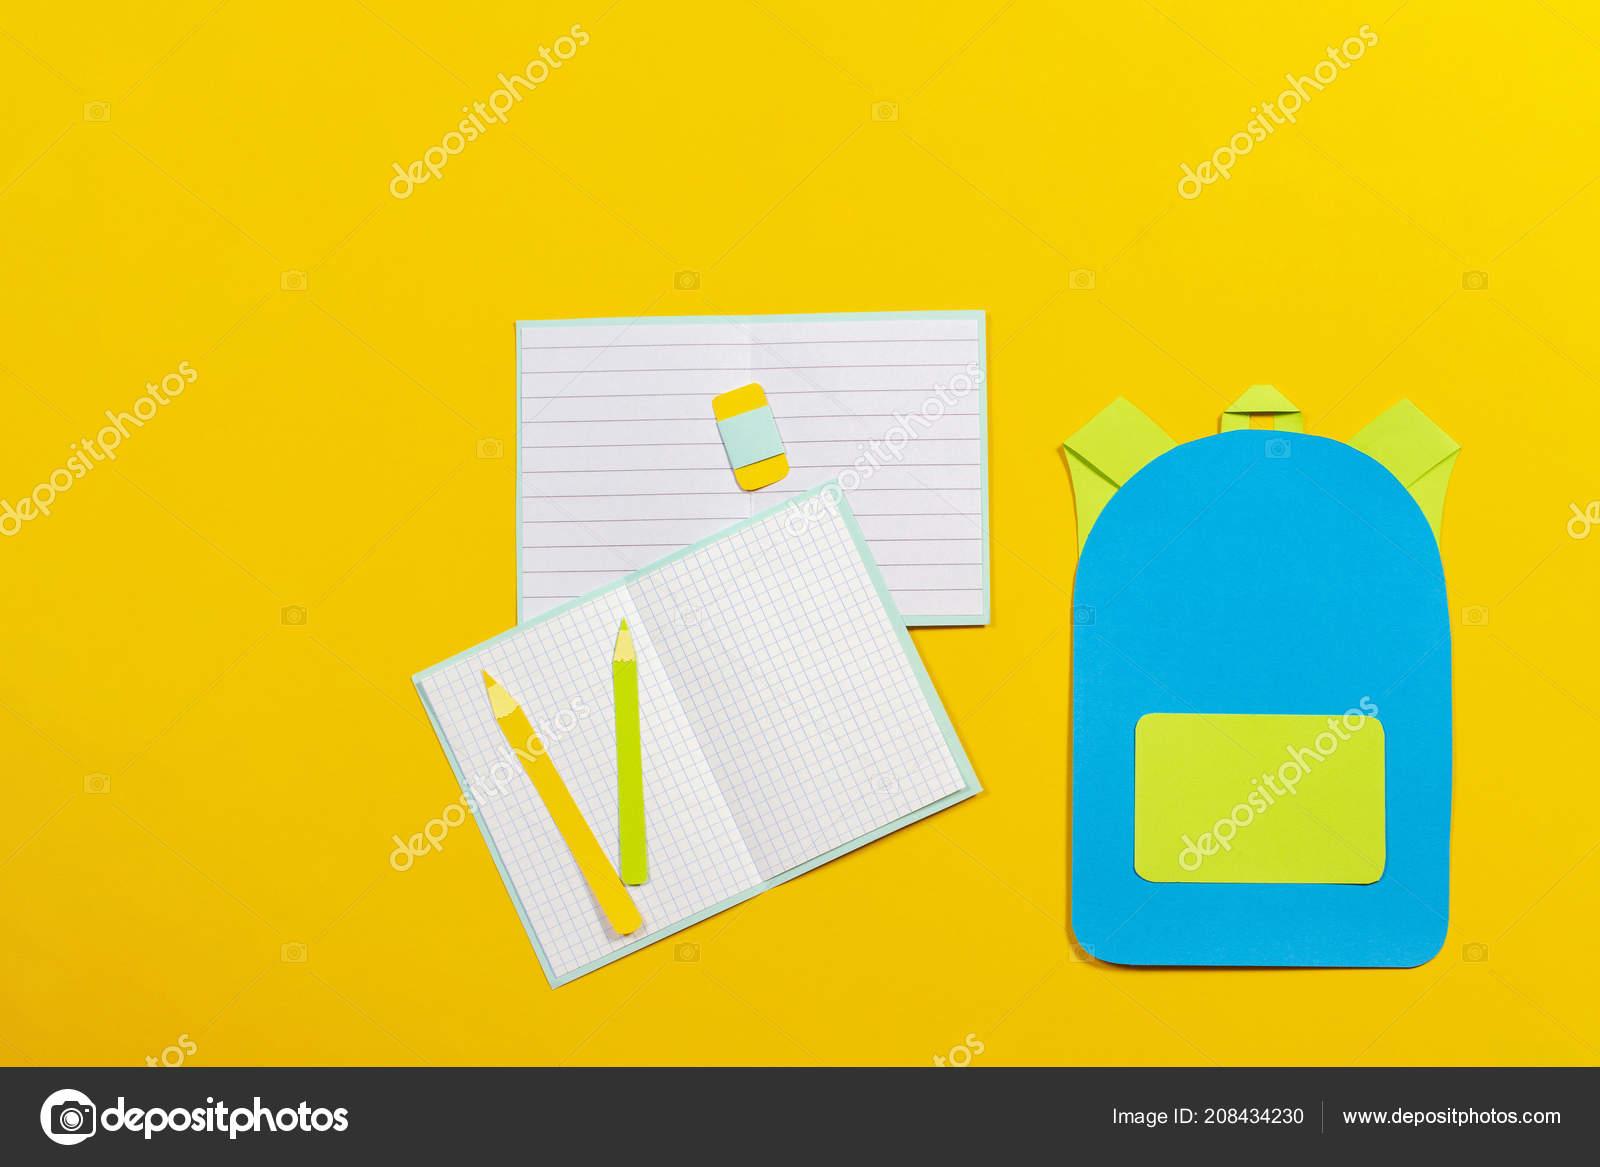 9cca637f29e Σχολική τσάντα πλάτης, τετράδια και μολύβια χαρτιού κομμένα σε κίτρινο  φόντο — Εικόνα από ...